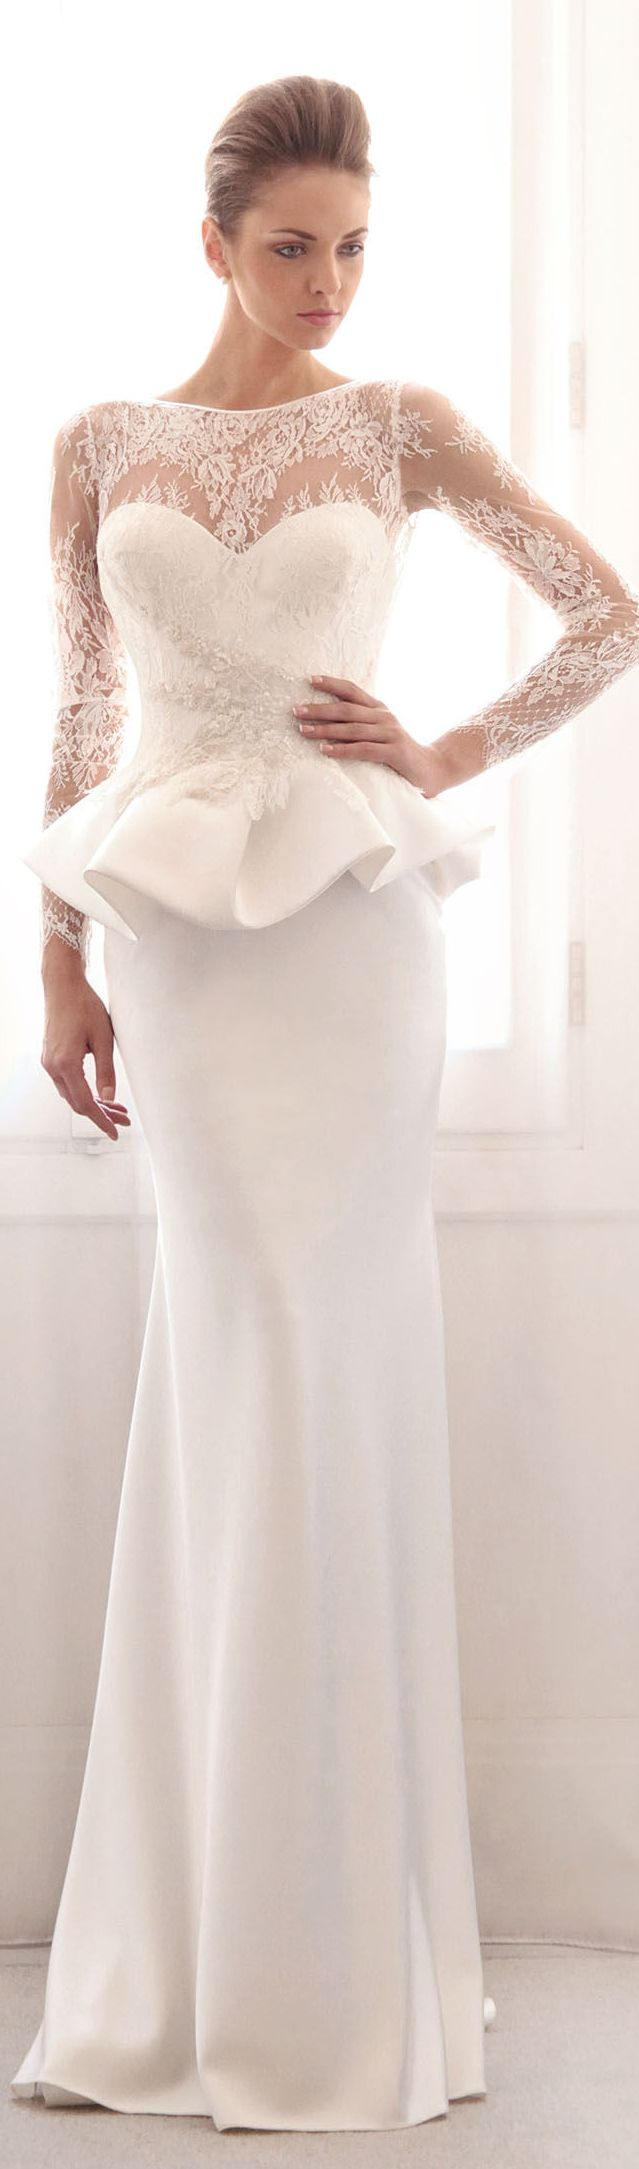 Gorgeous peplum wedding dress. Gemy Maalouf Bridal S/S 2014 ...